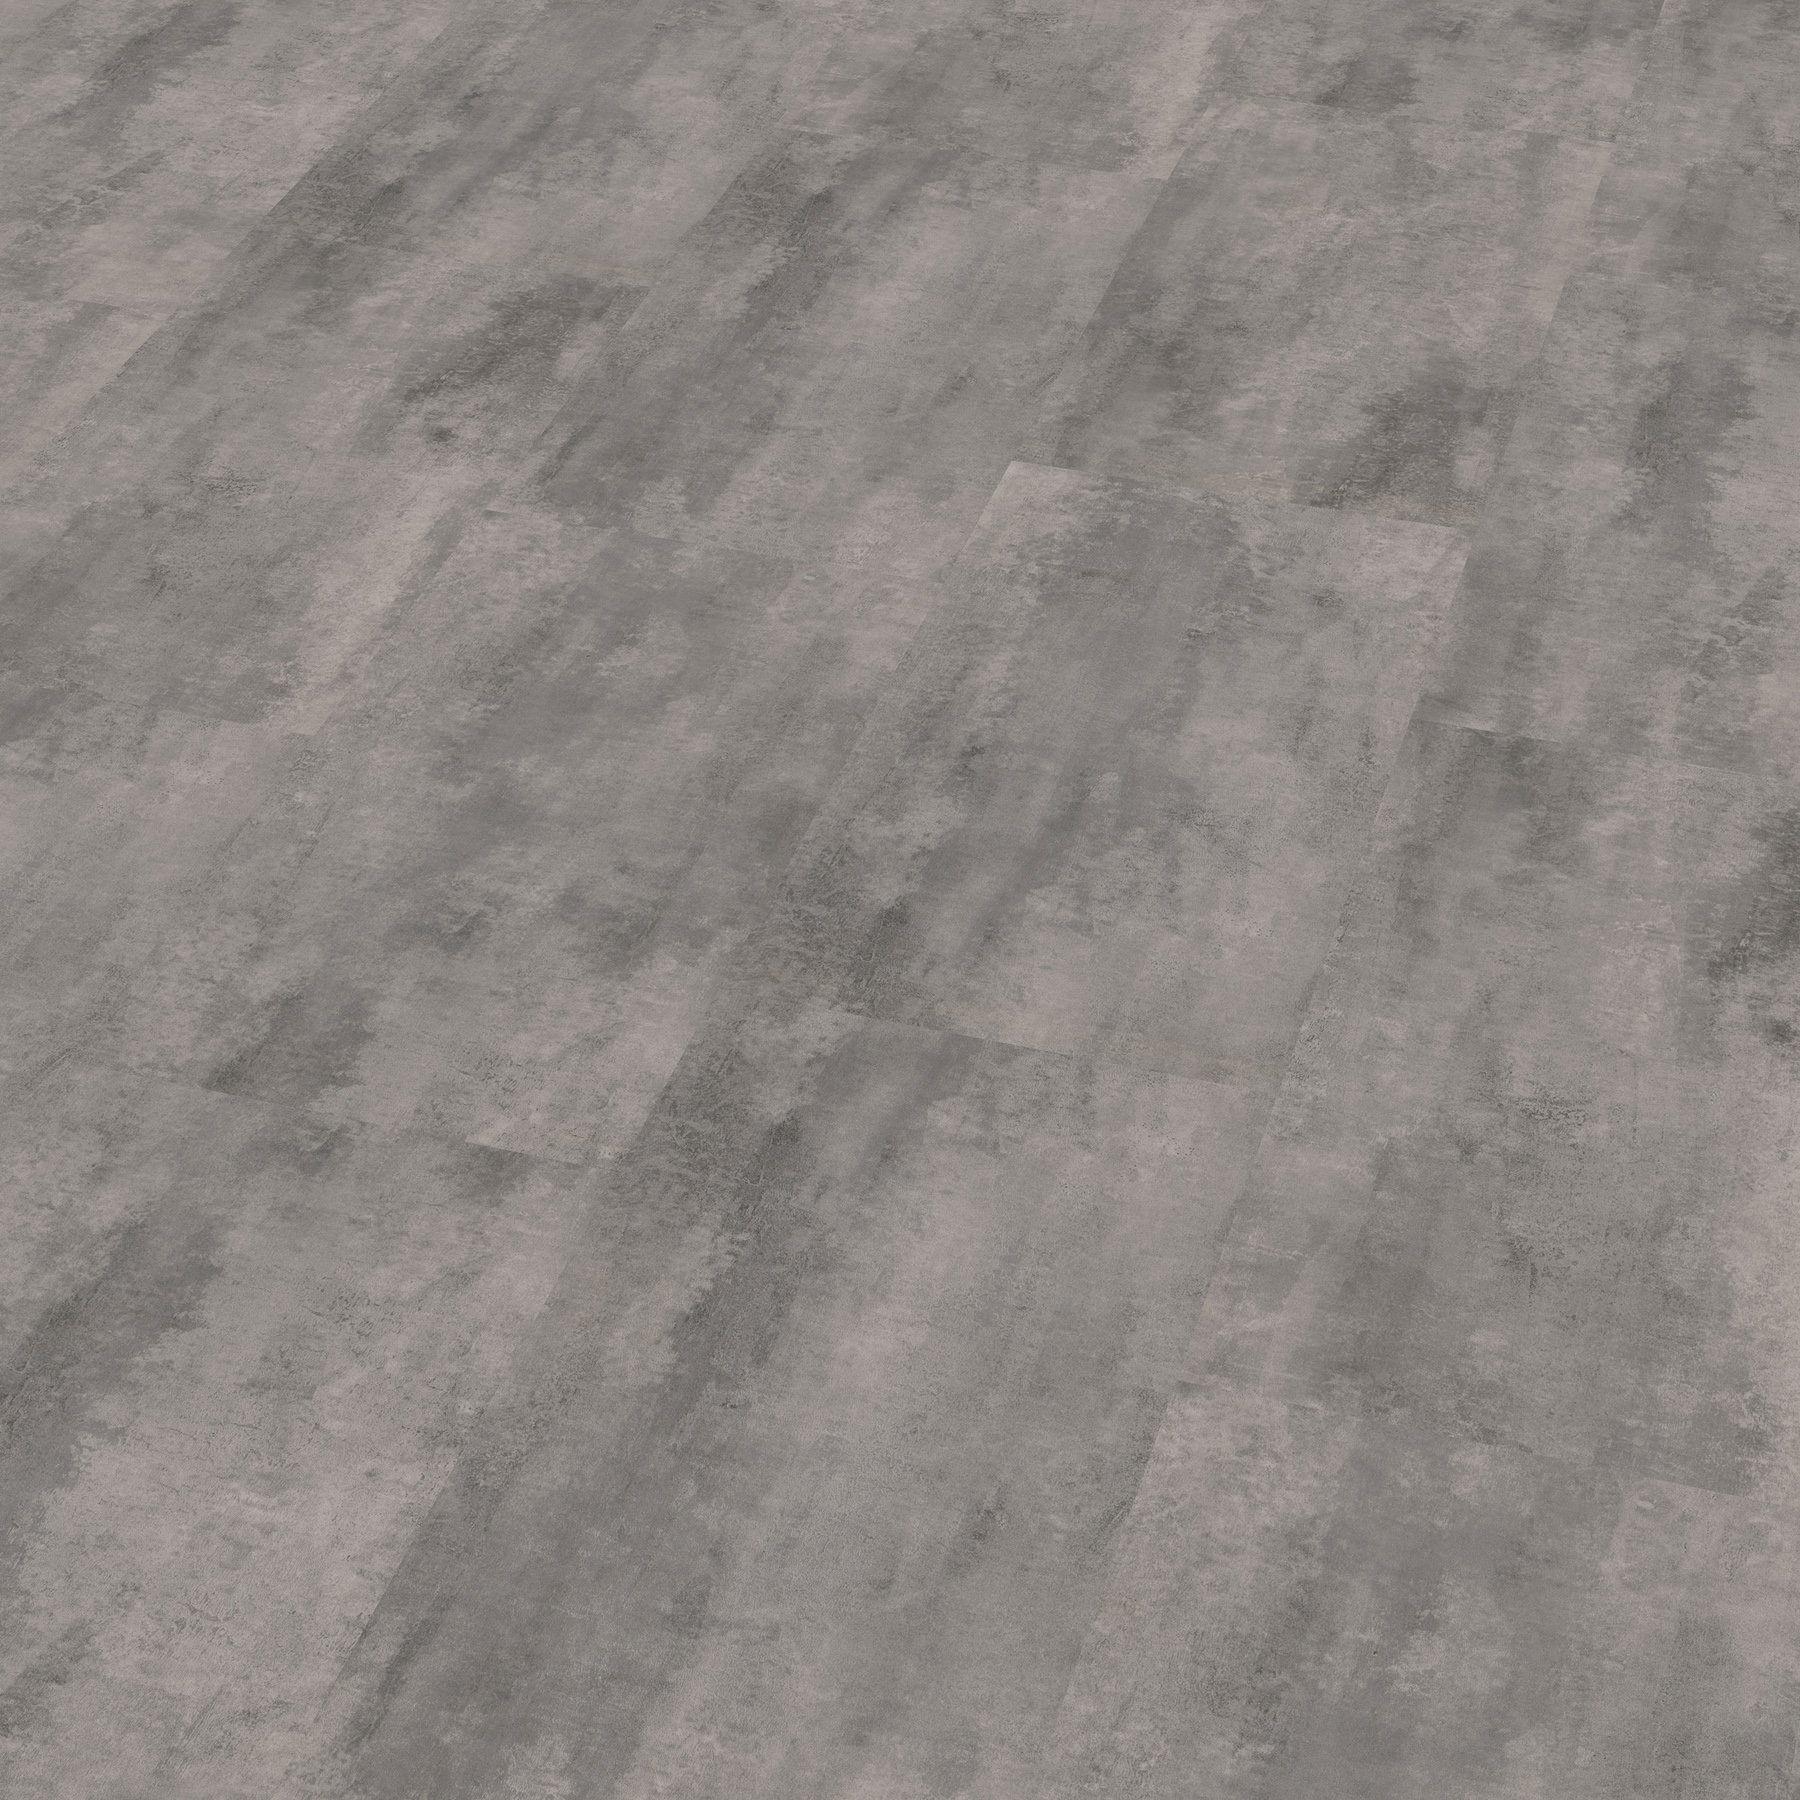 vinilovye-poly-wineo-400-db-stone-glamour-concrete-modern-23004855363270